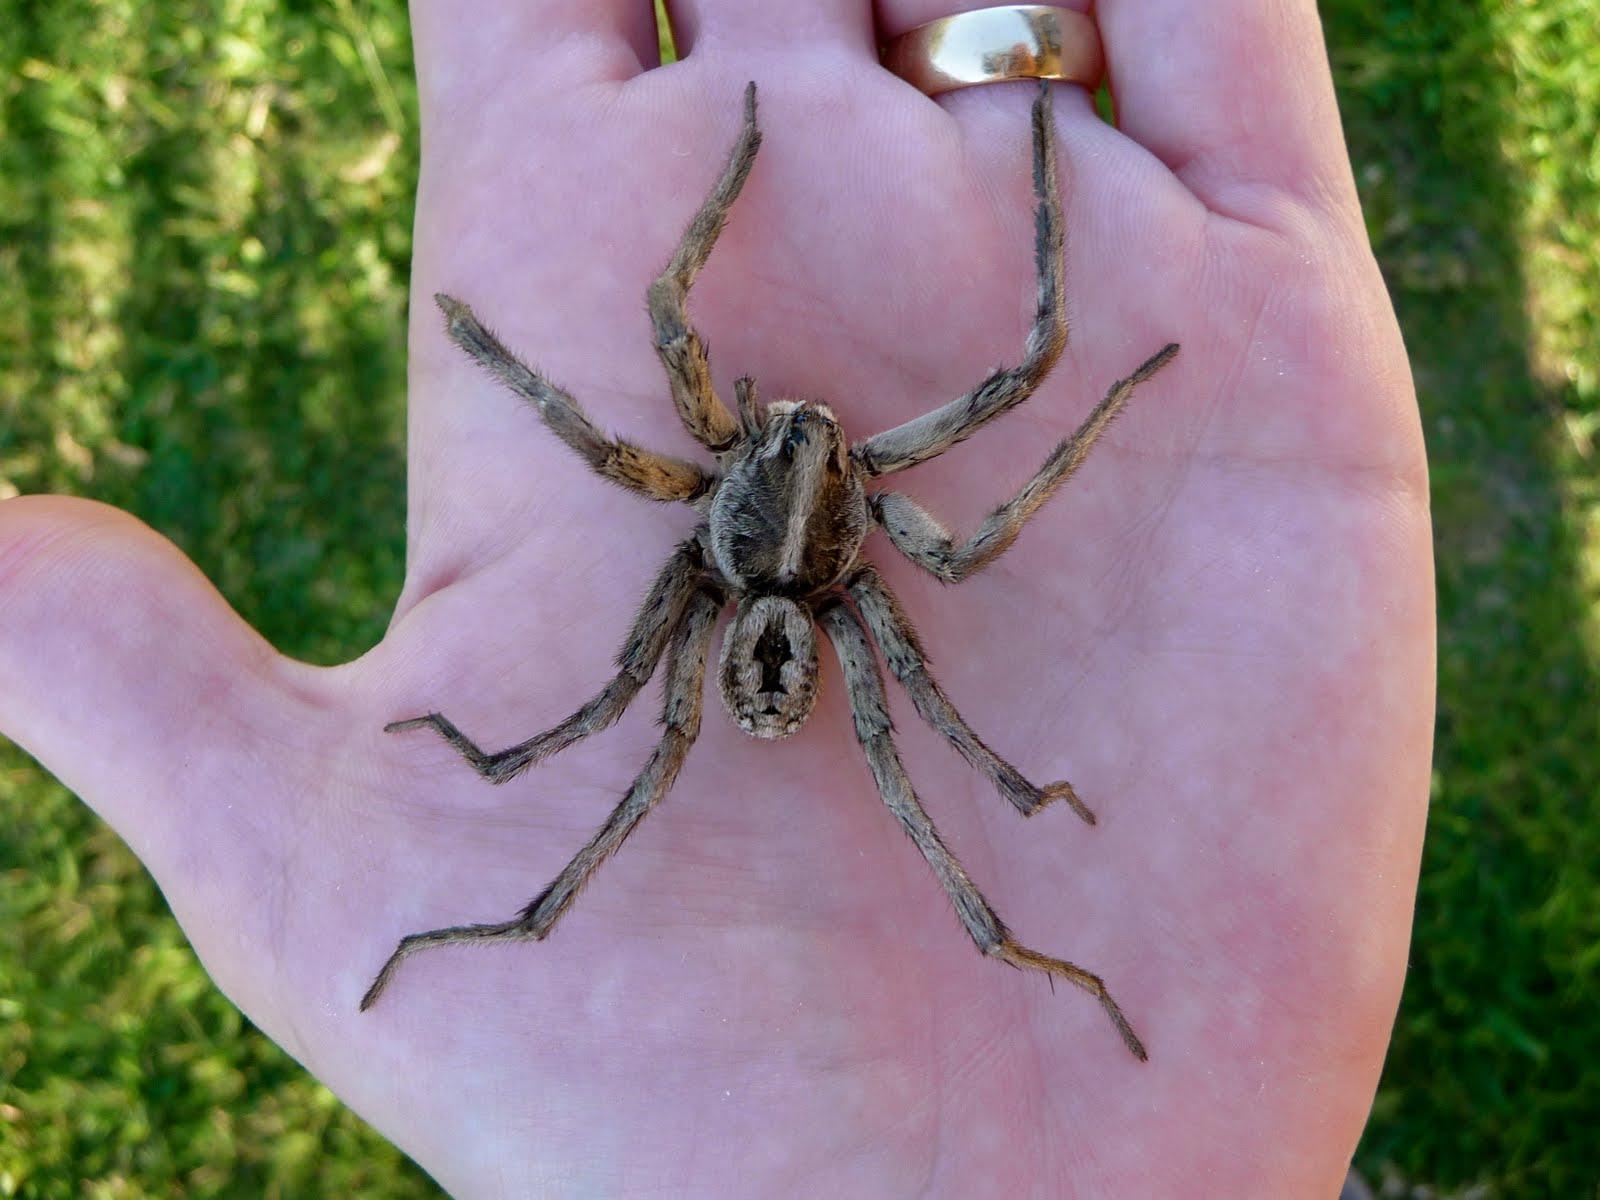 My Little Bit of Heaven: One Big Honkin' Spider